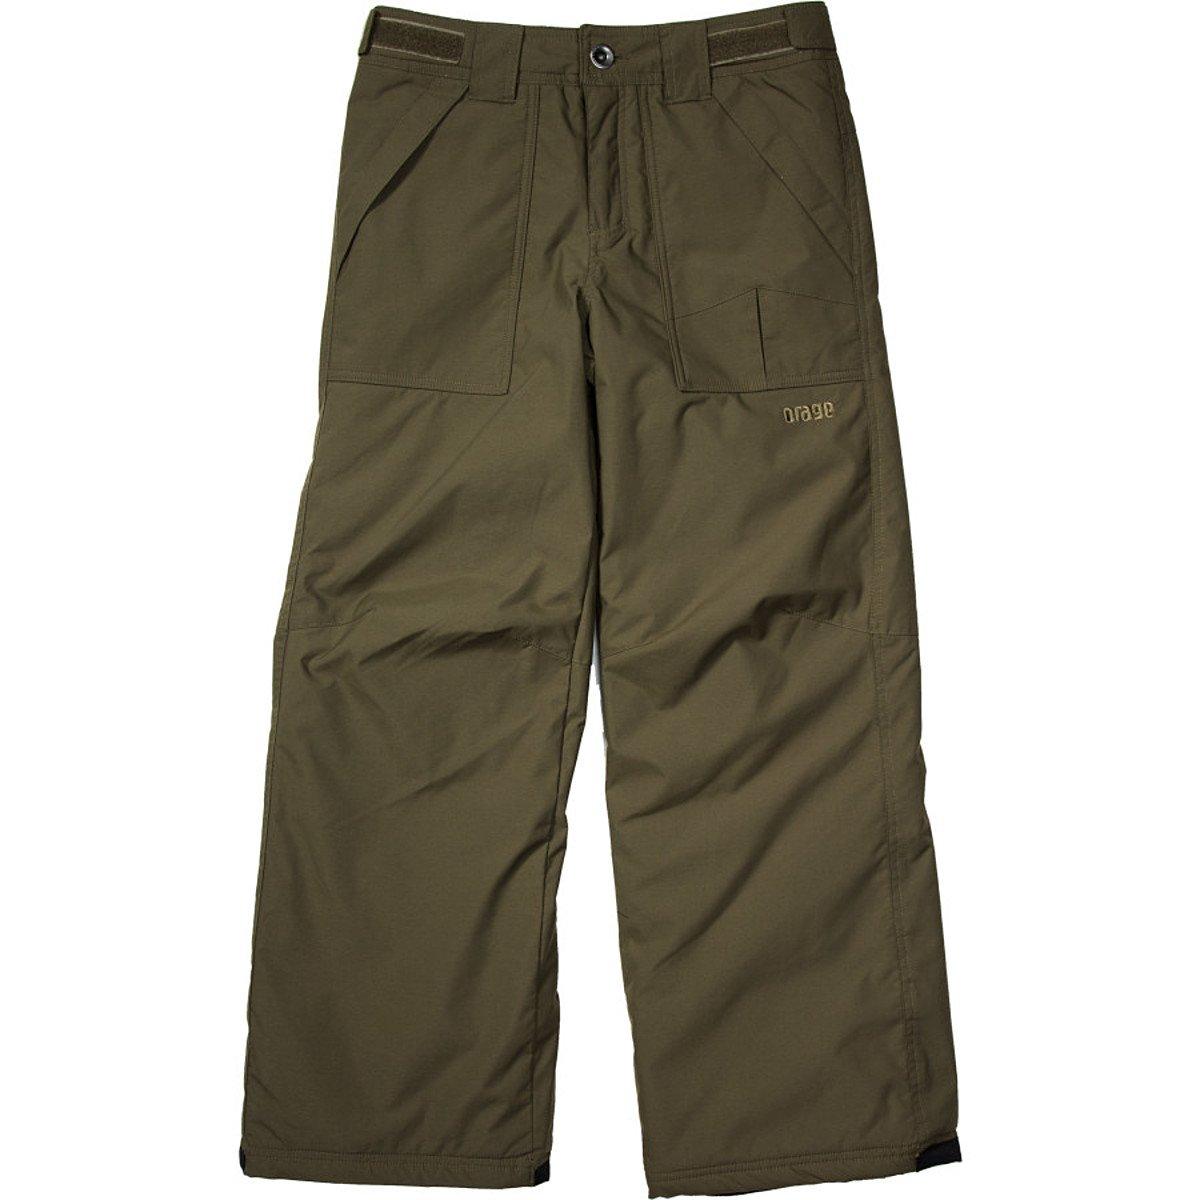 orage Boys Tarzo Pants, Tarmac, Size 16/XX-Large by Orage